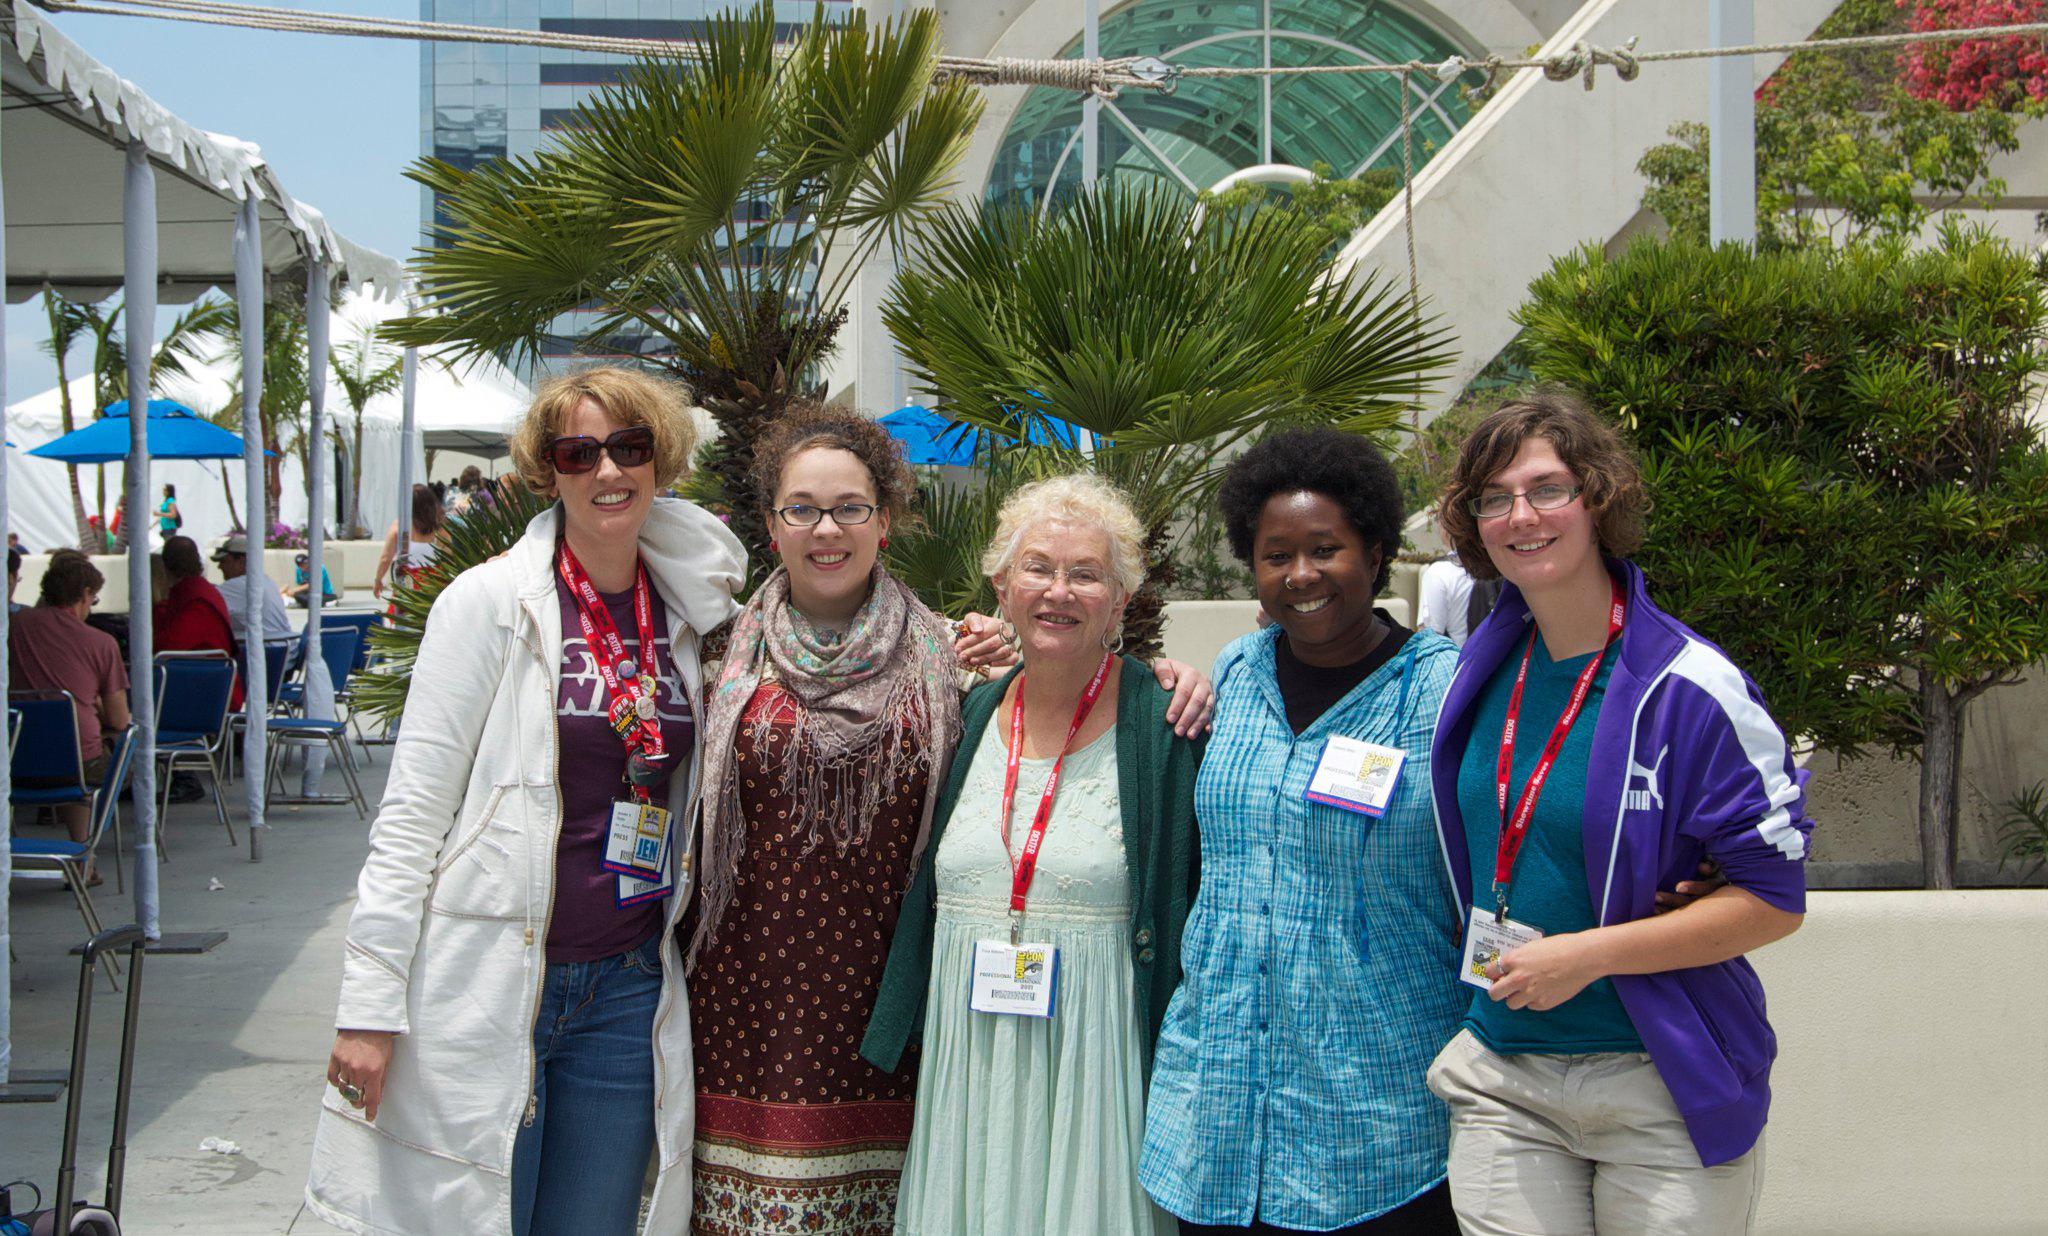 Annual Women Comics Scholars Meetup (From the left: Jennifer K. Stuller, Jacque Nodell, Trina Robbins, Candace West and April Murphy)